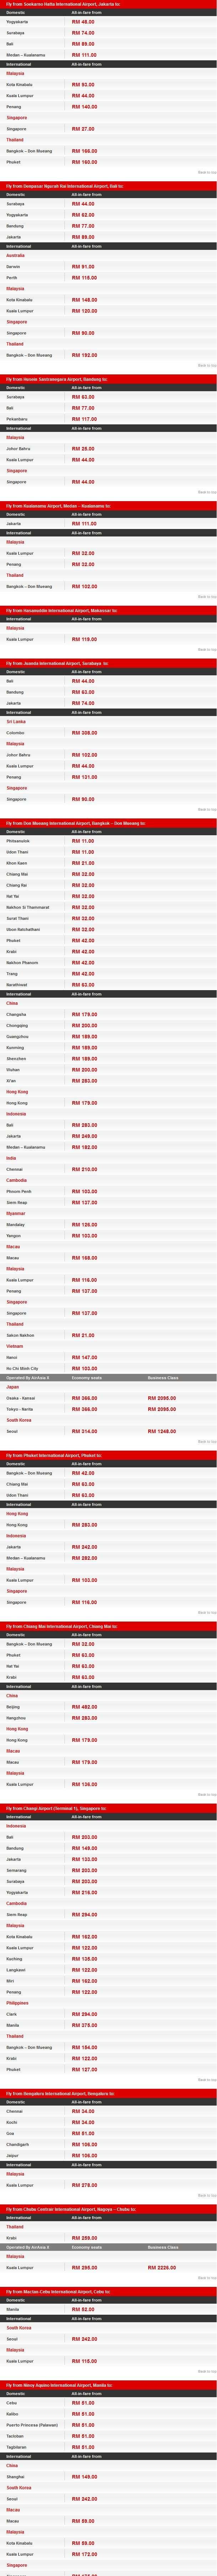 AirAsia Free Seats Promotion 2015 Fares Details